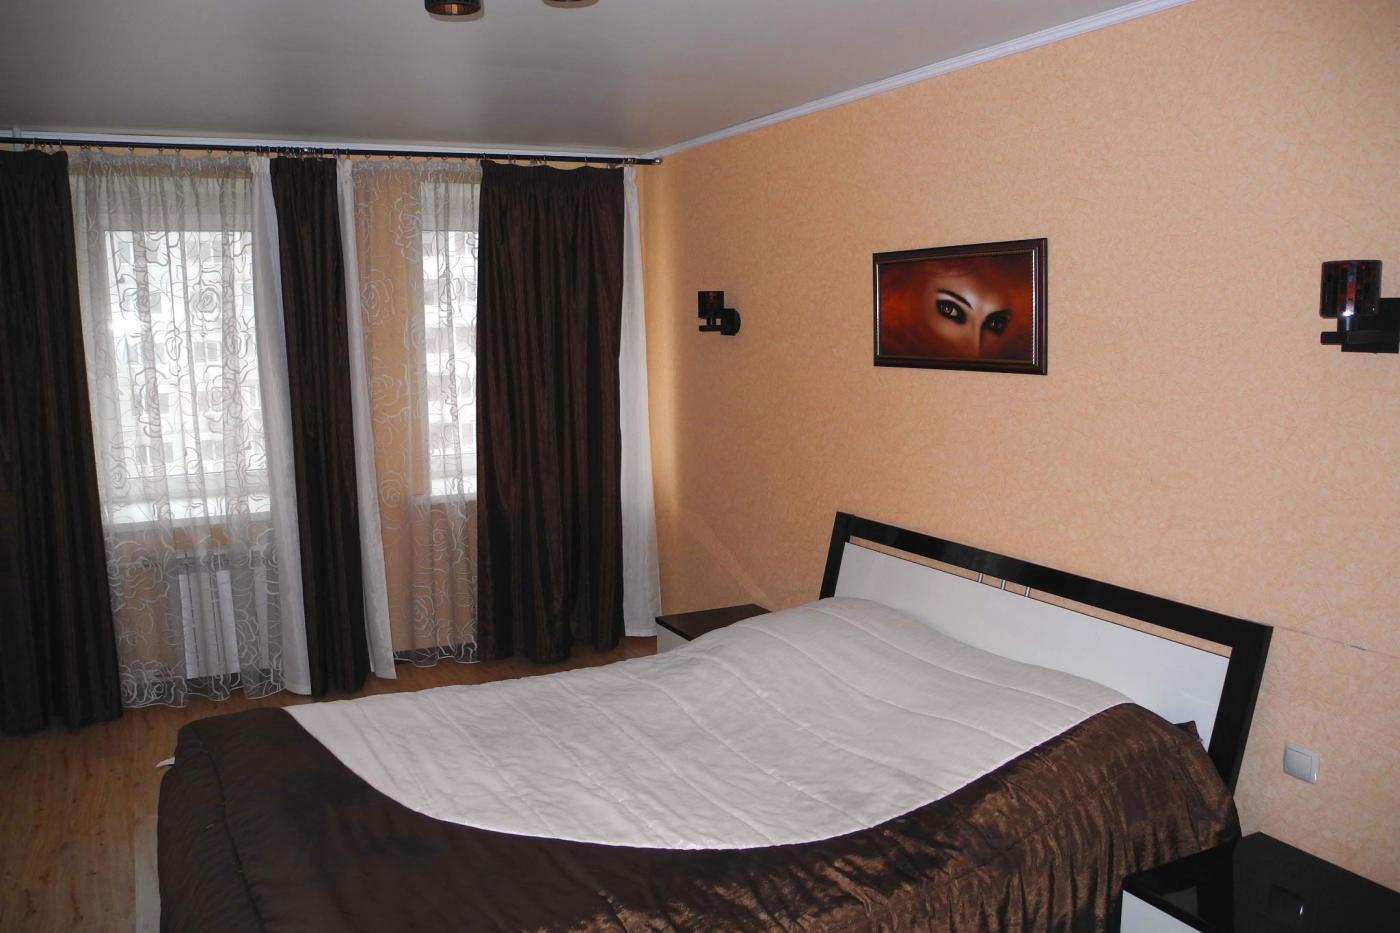 2-комнатная квартира посуточно (вариант № 3876), ул. Войкова улица, фото № 7